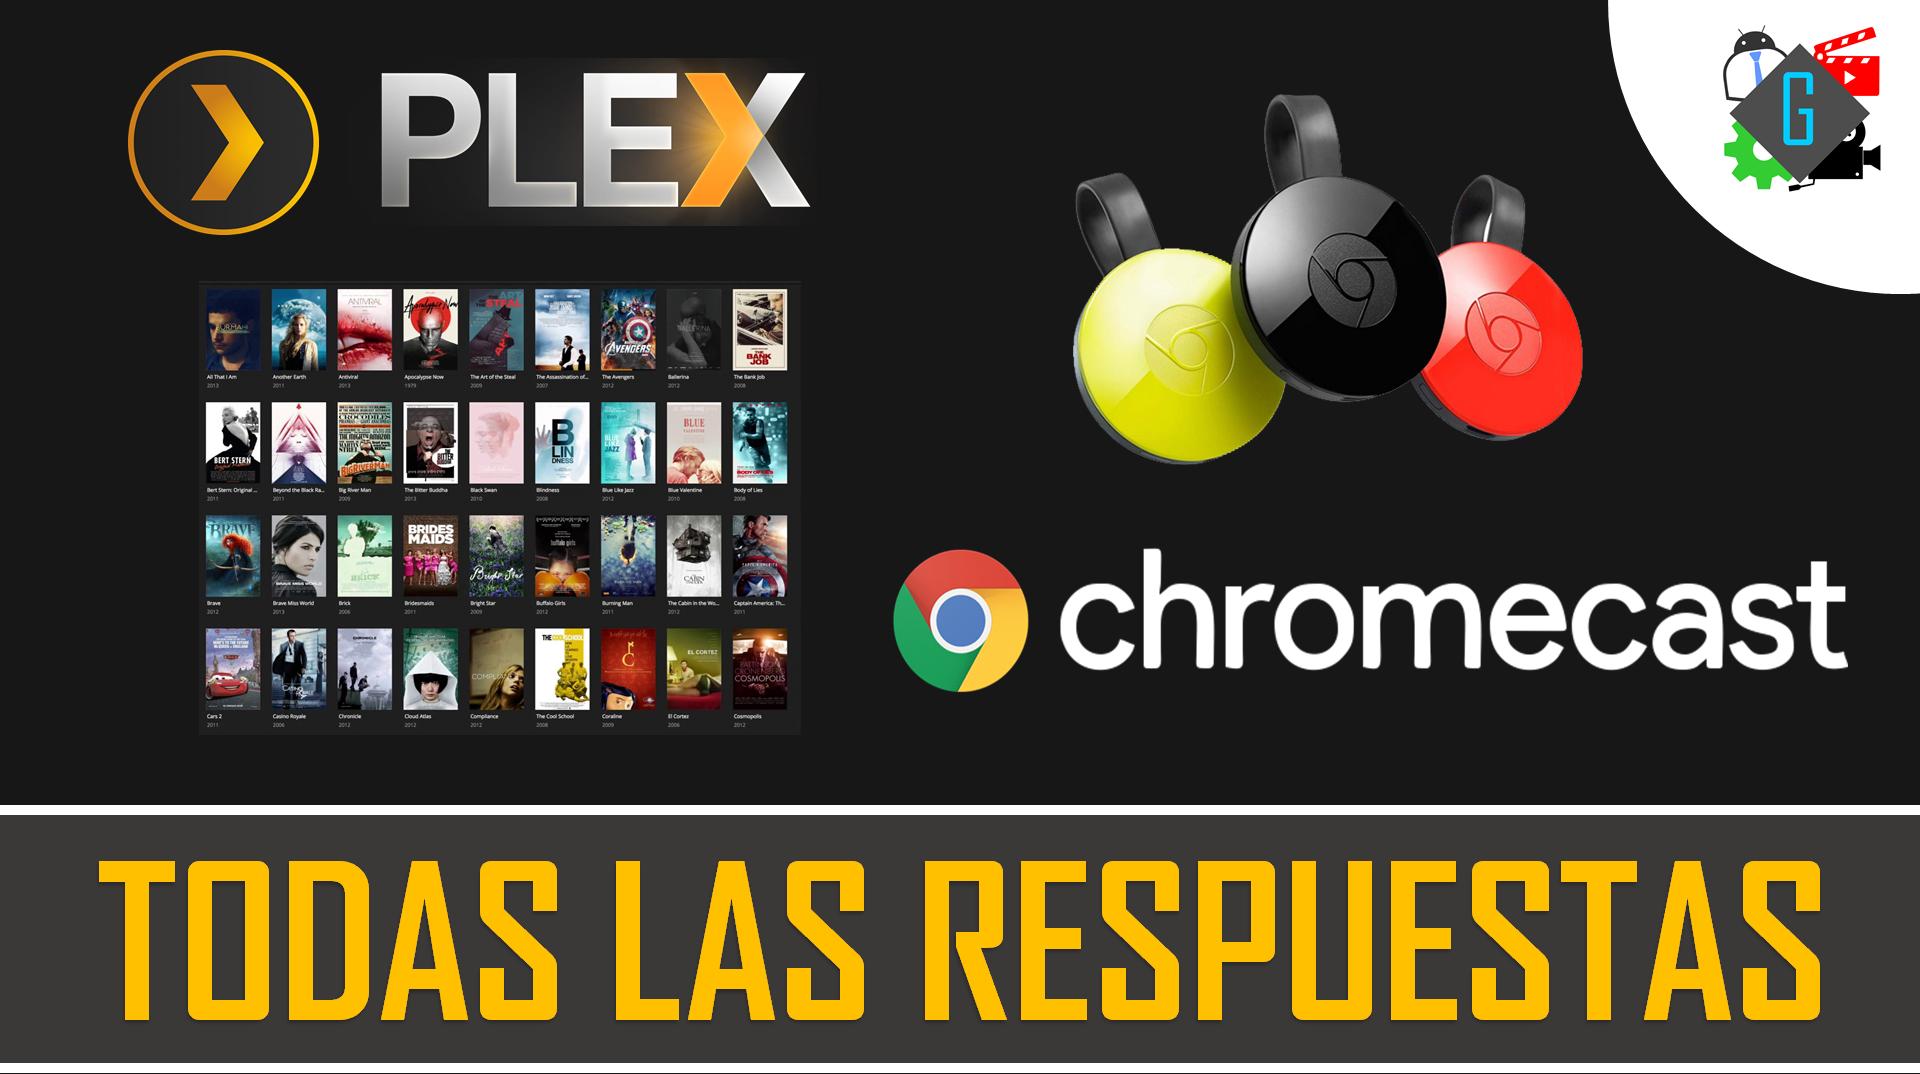 PLEX chromecast